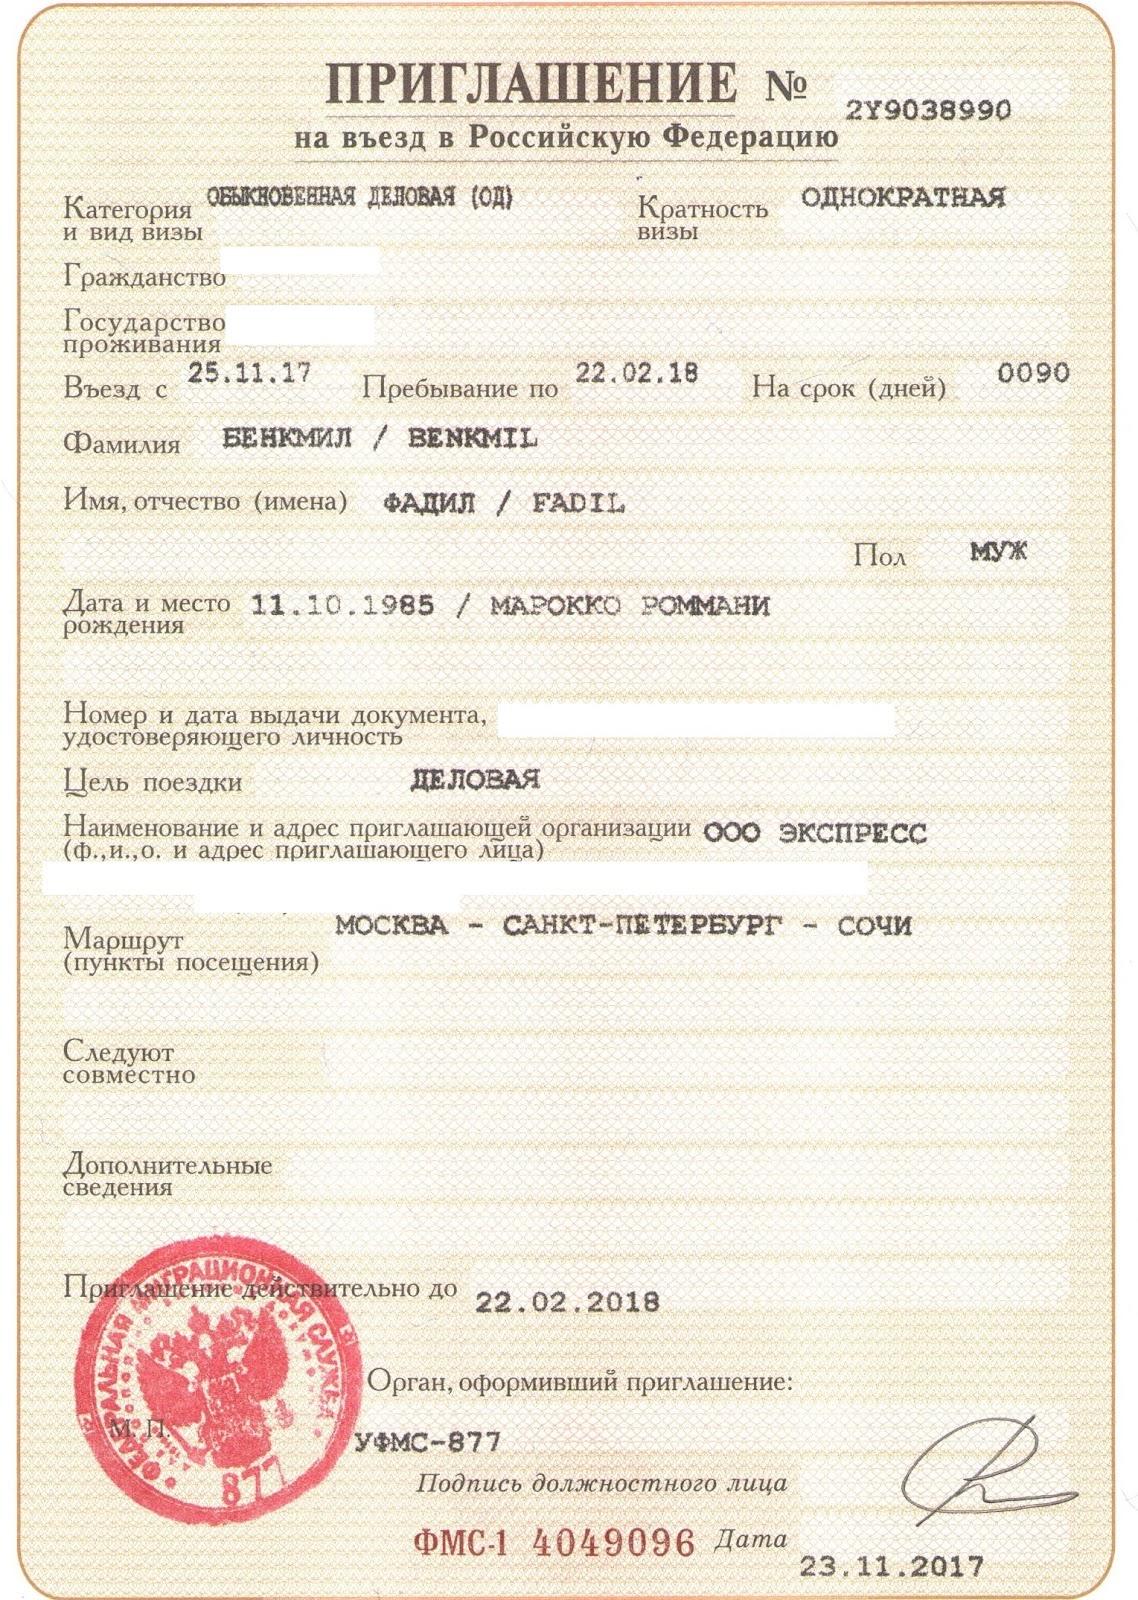 Business invitation to Russia sample